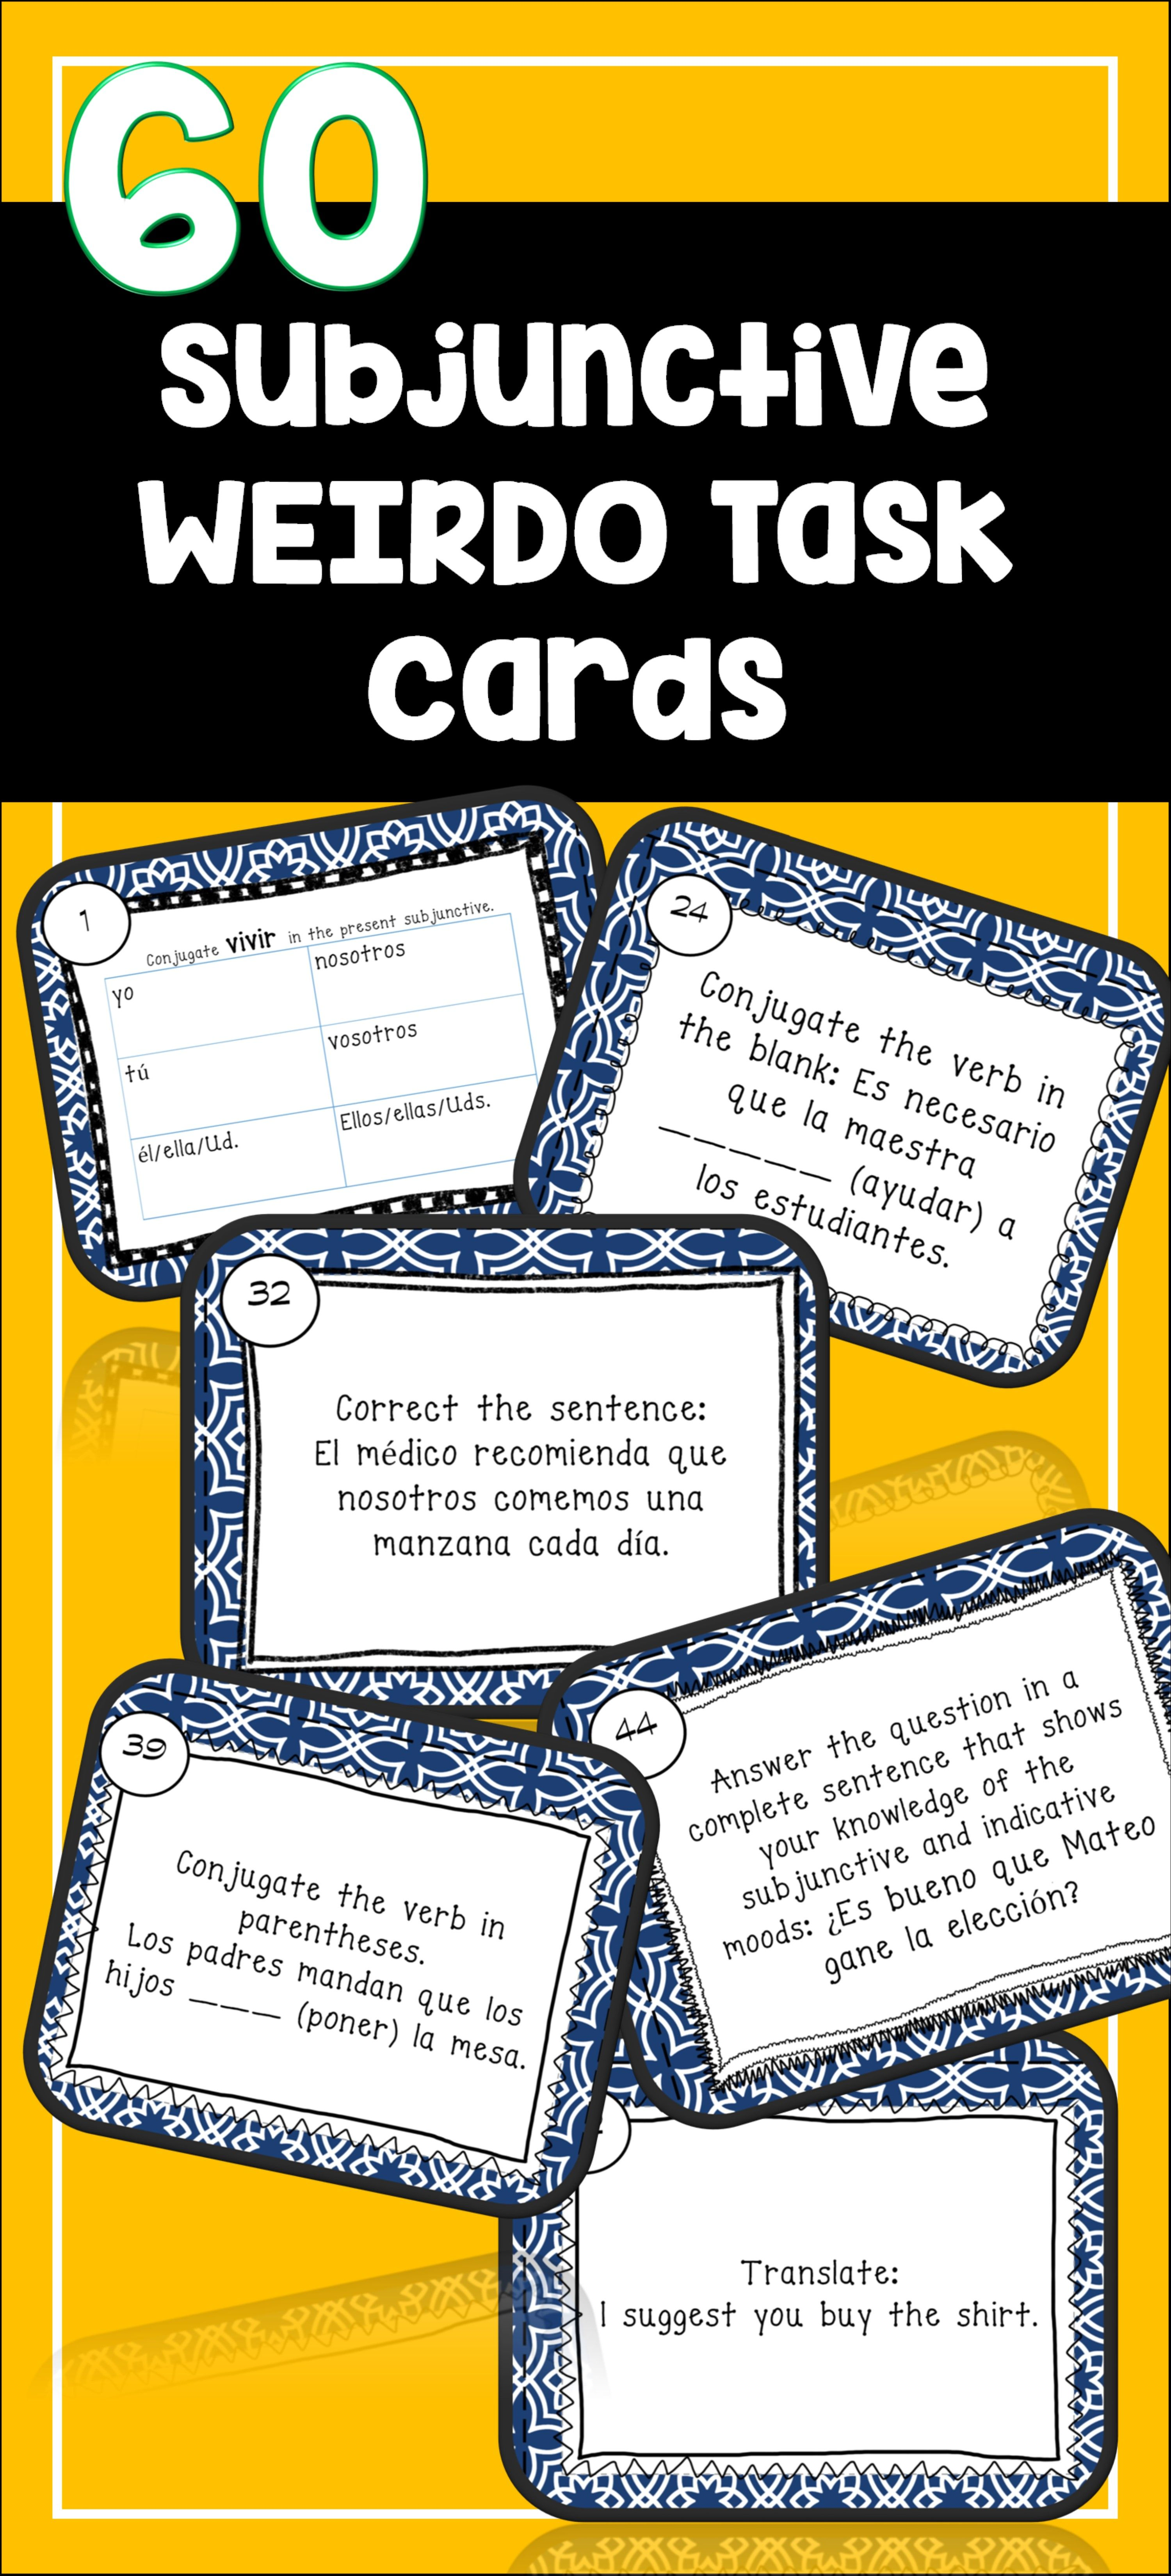 Weirdo Subjunctive Worksheet